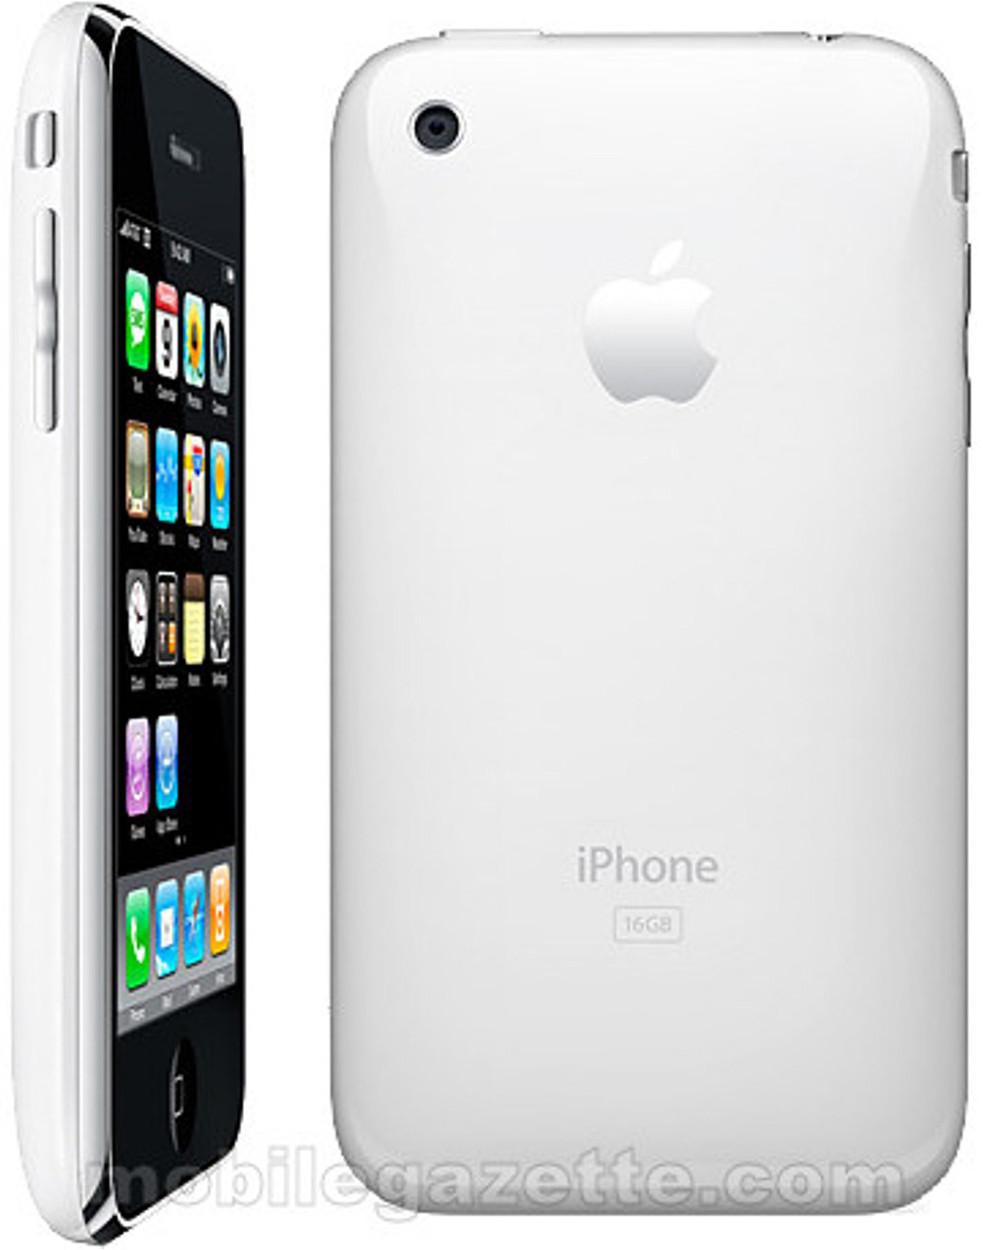 apple iphone 3gs 16gb price